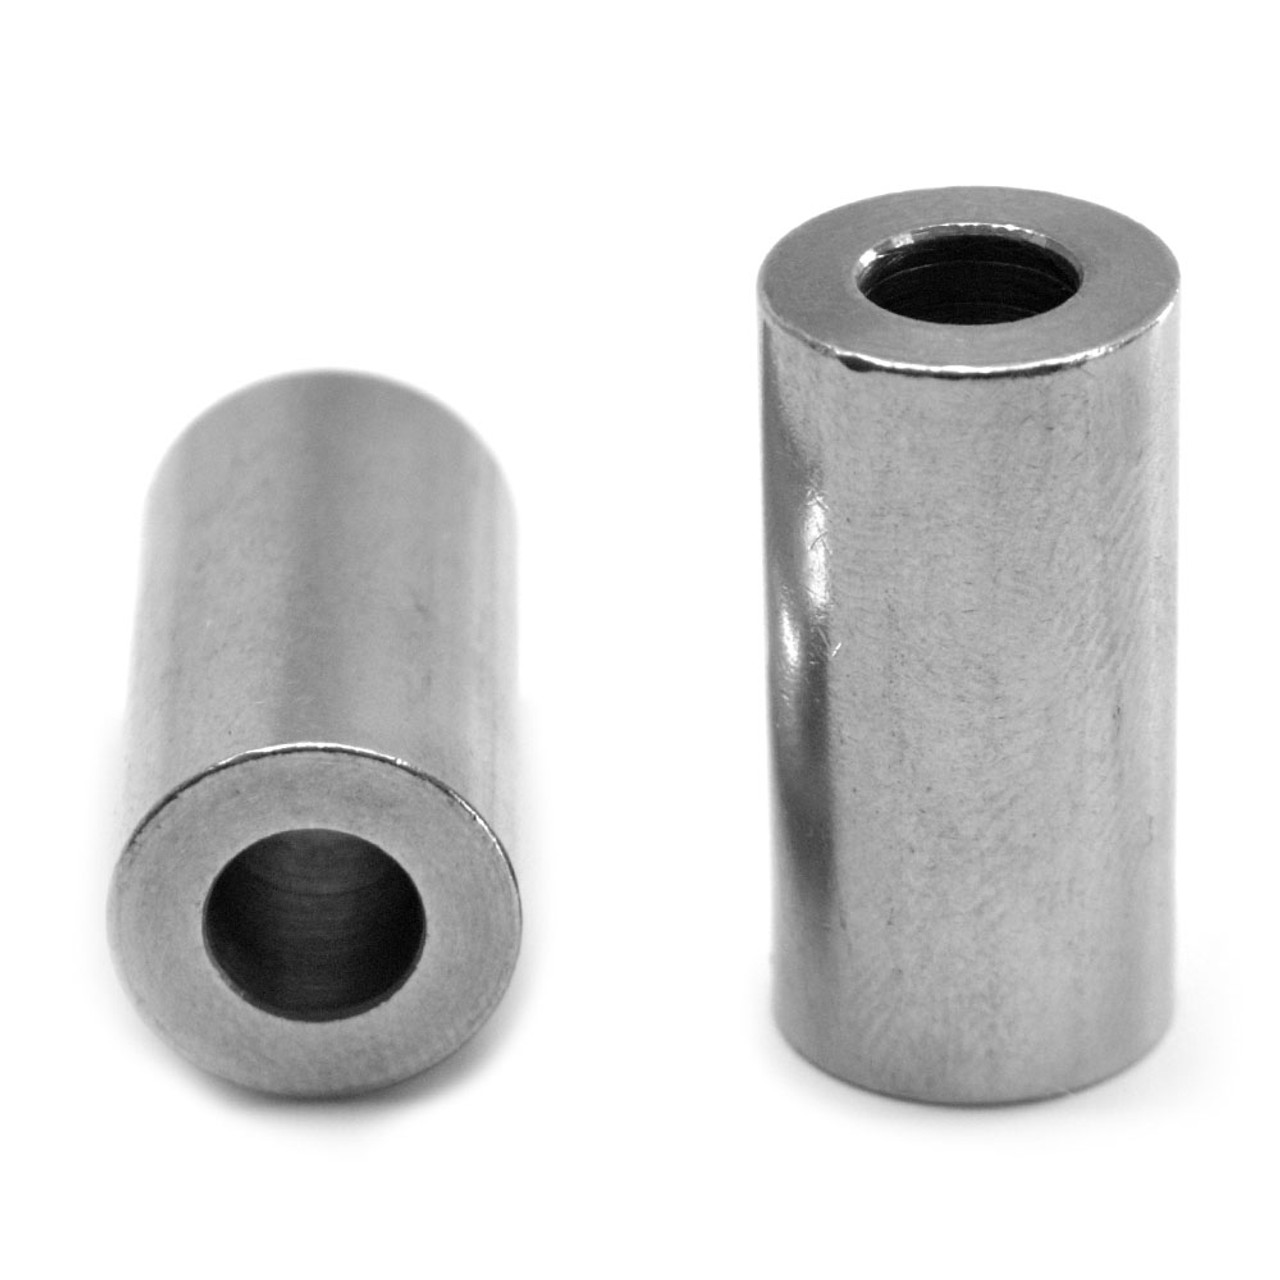 Steel Components Kipp 06610-21086X50 Fiberglass Reinforced Plastic//Steel Adjustable Handle with M10 External Thread,Novo/·Grip Style Metric 50 mm Screw Length Signal Green Color Size 2